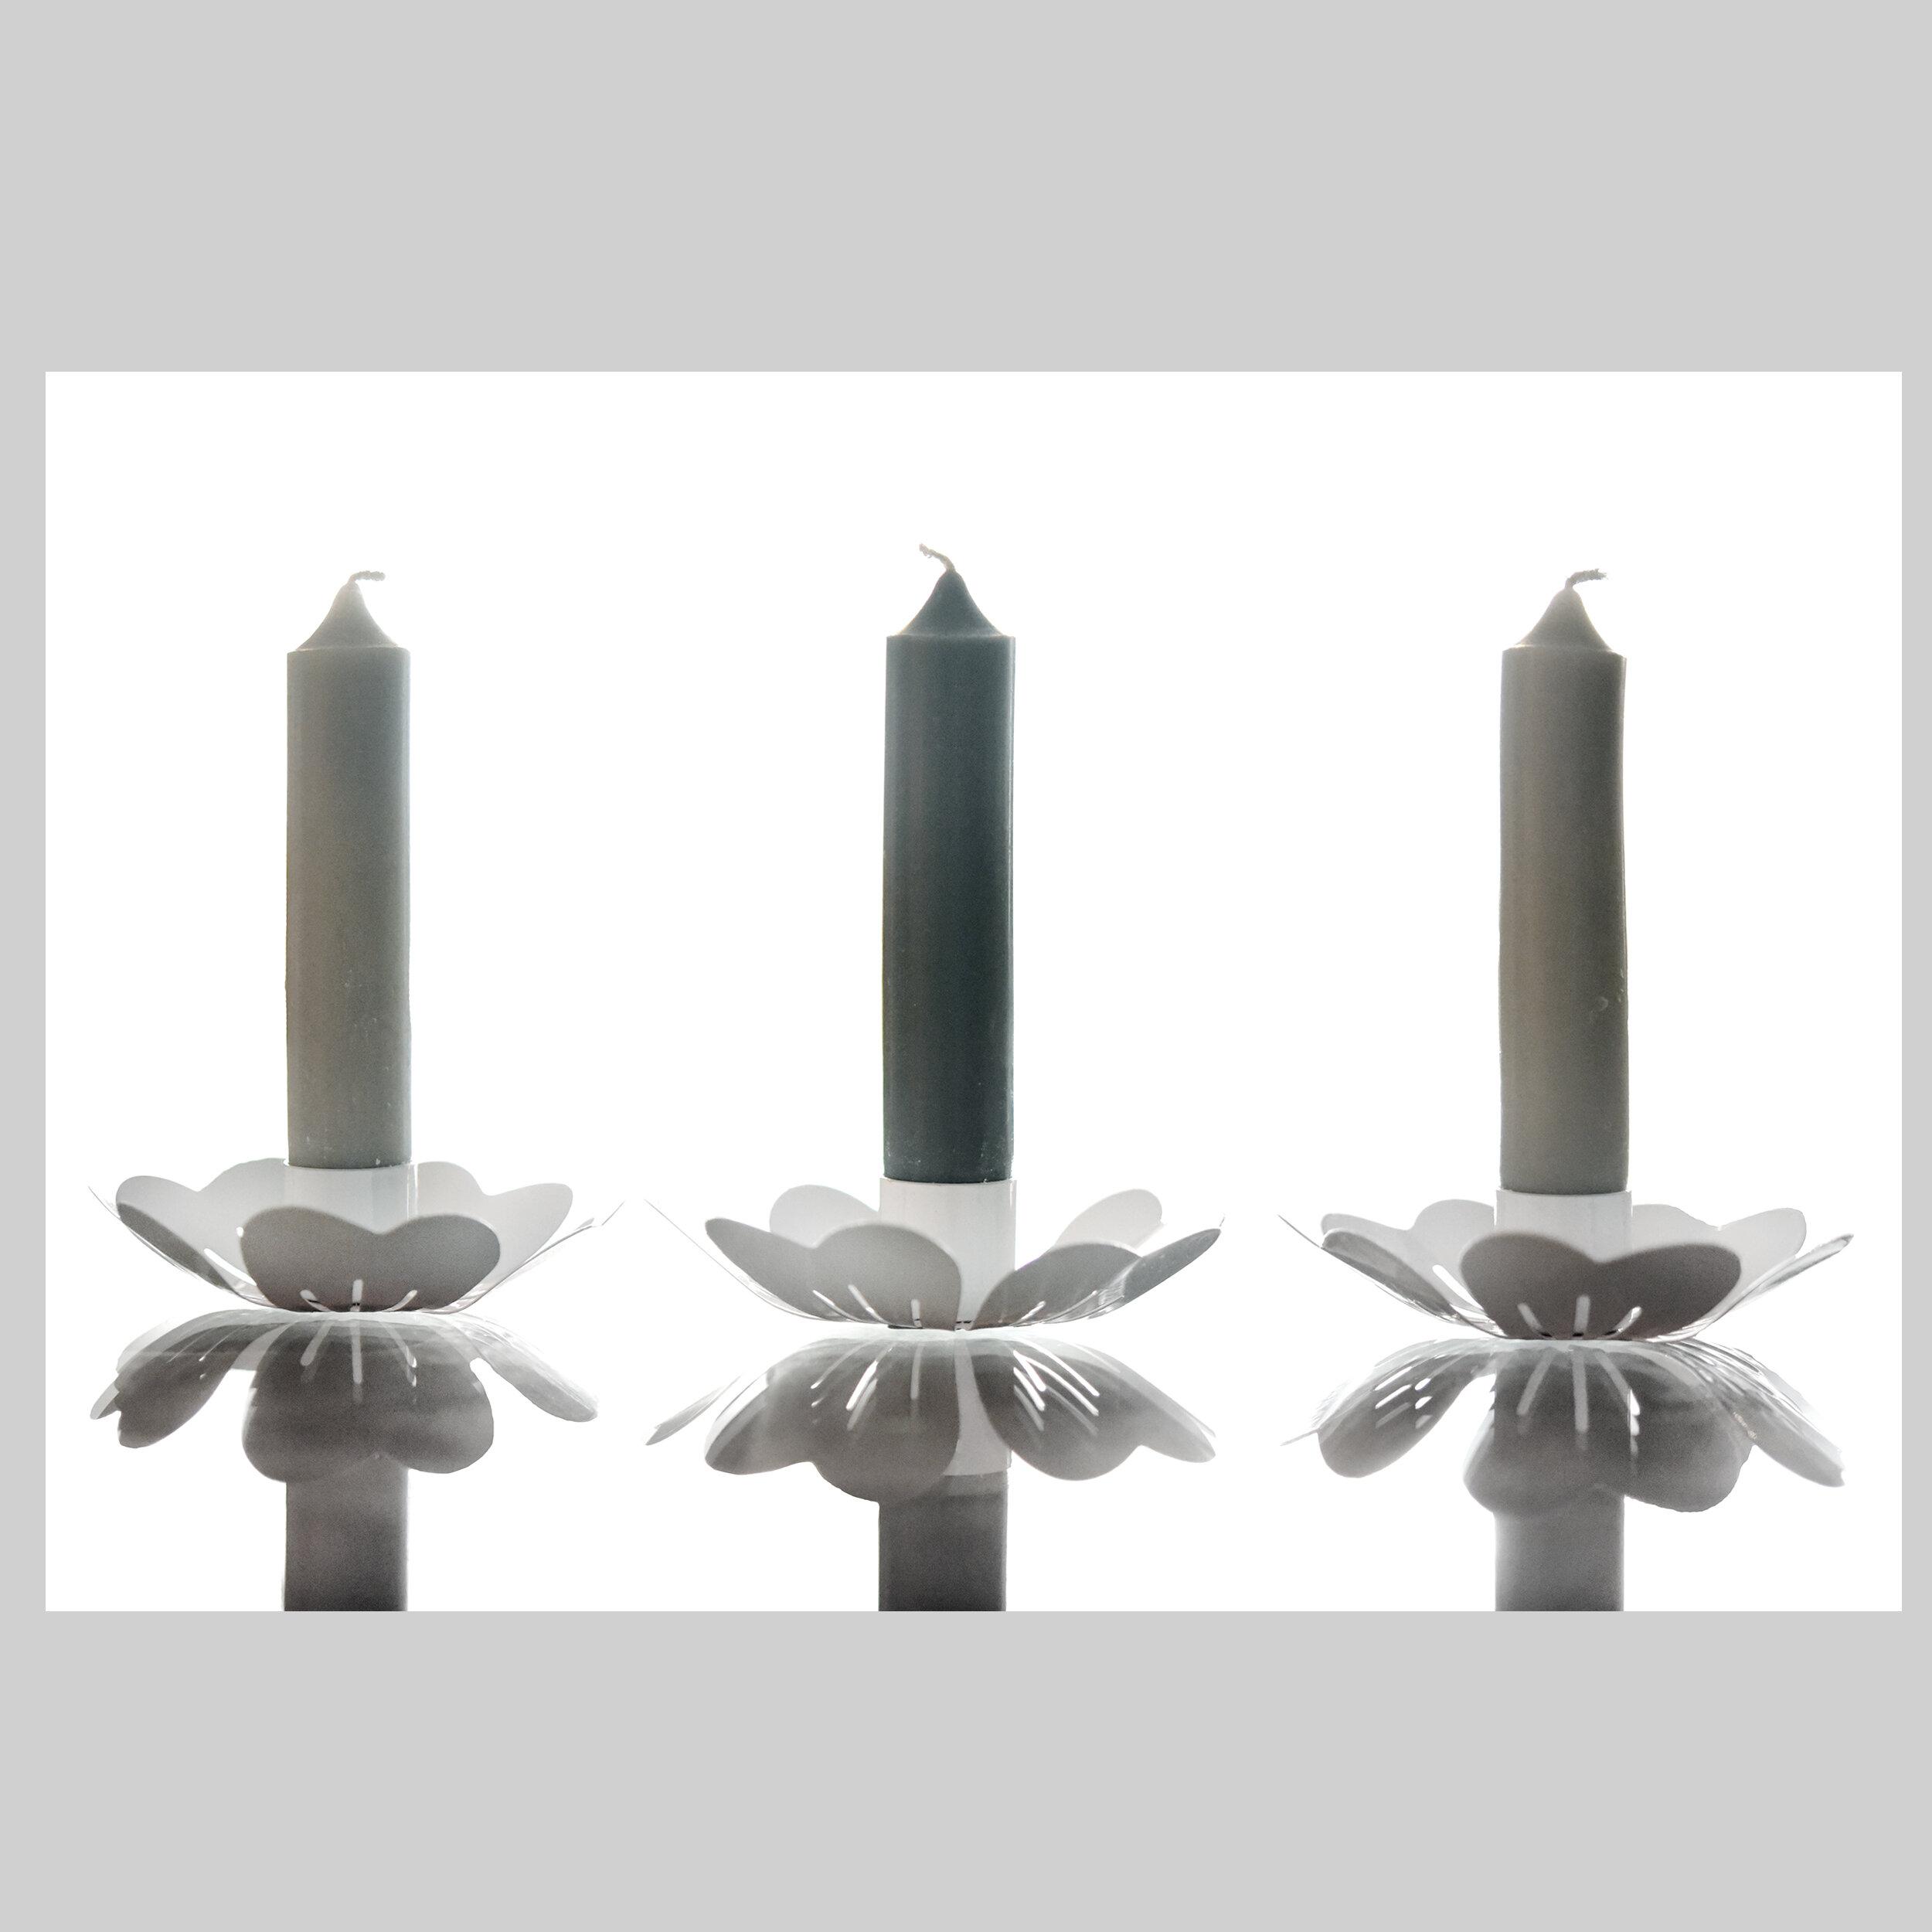 2 Scandinavian Candle Holders Dunster Living Shop